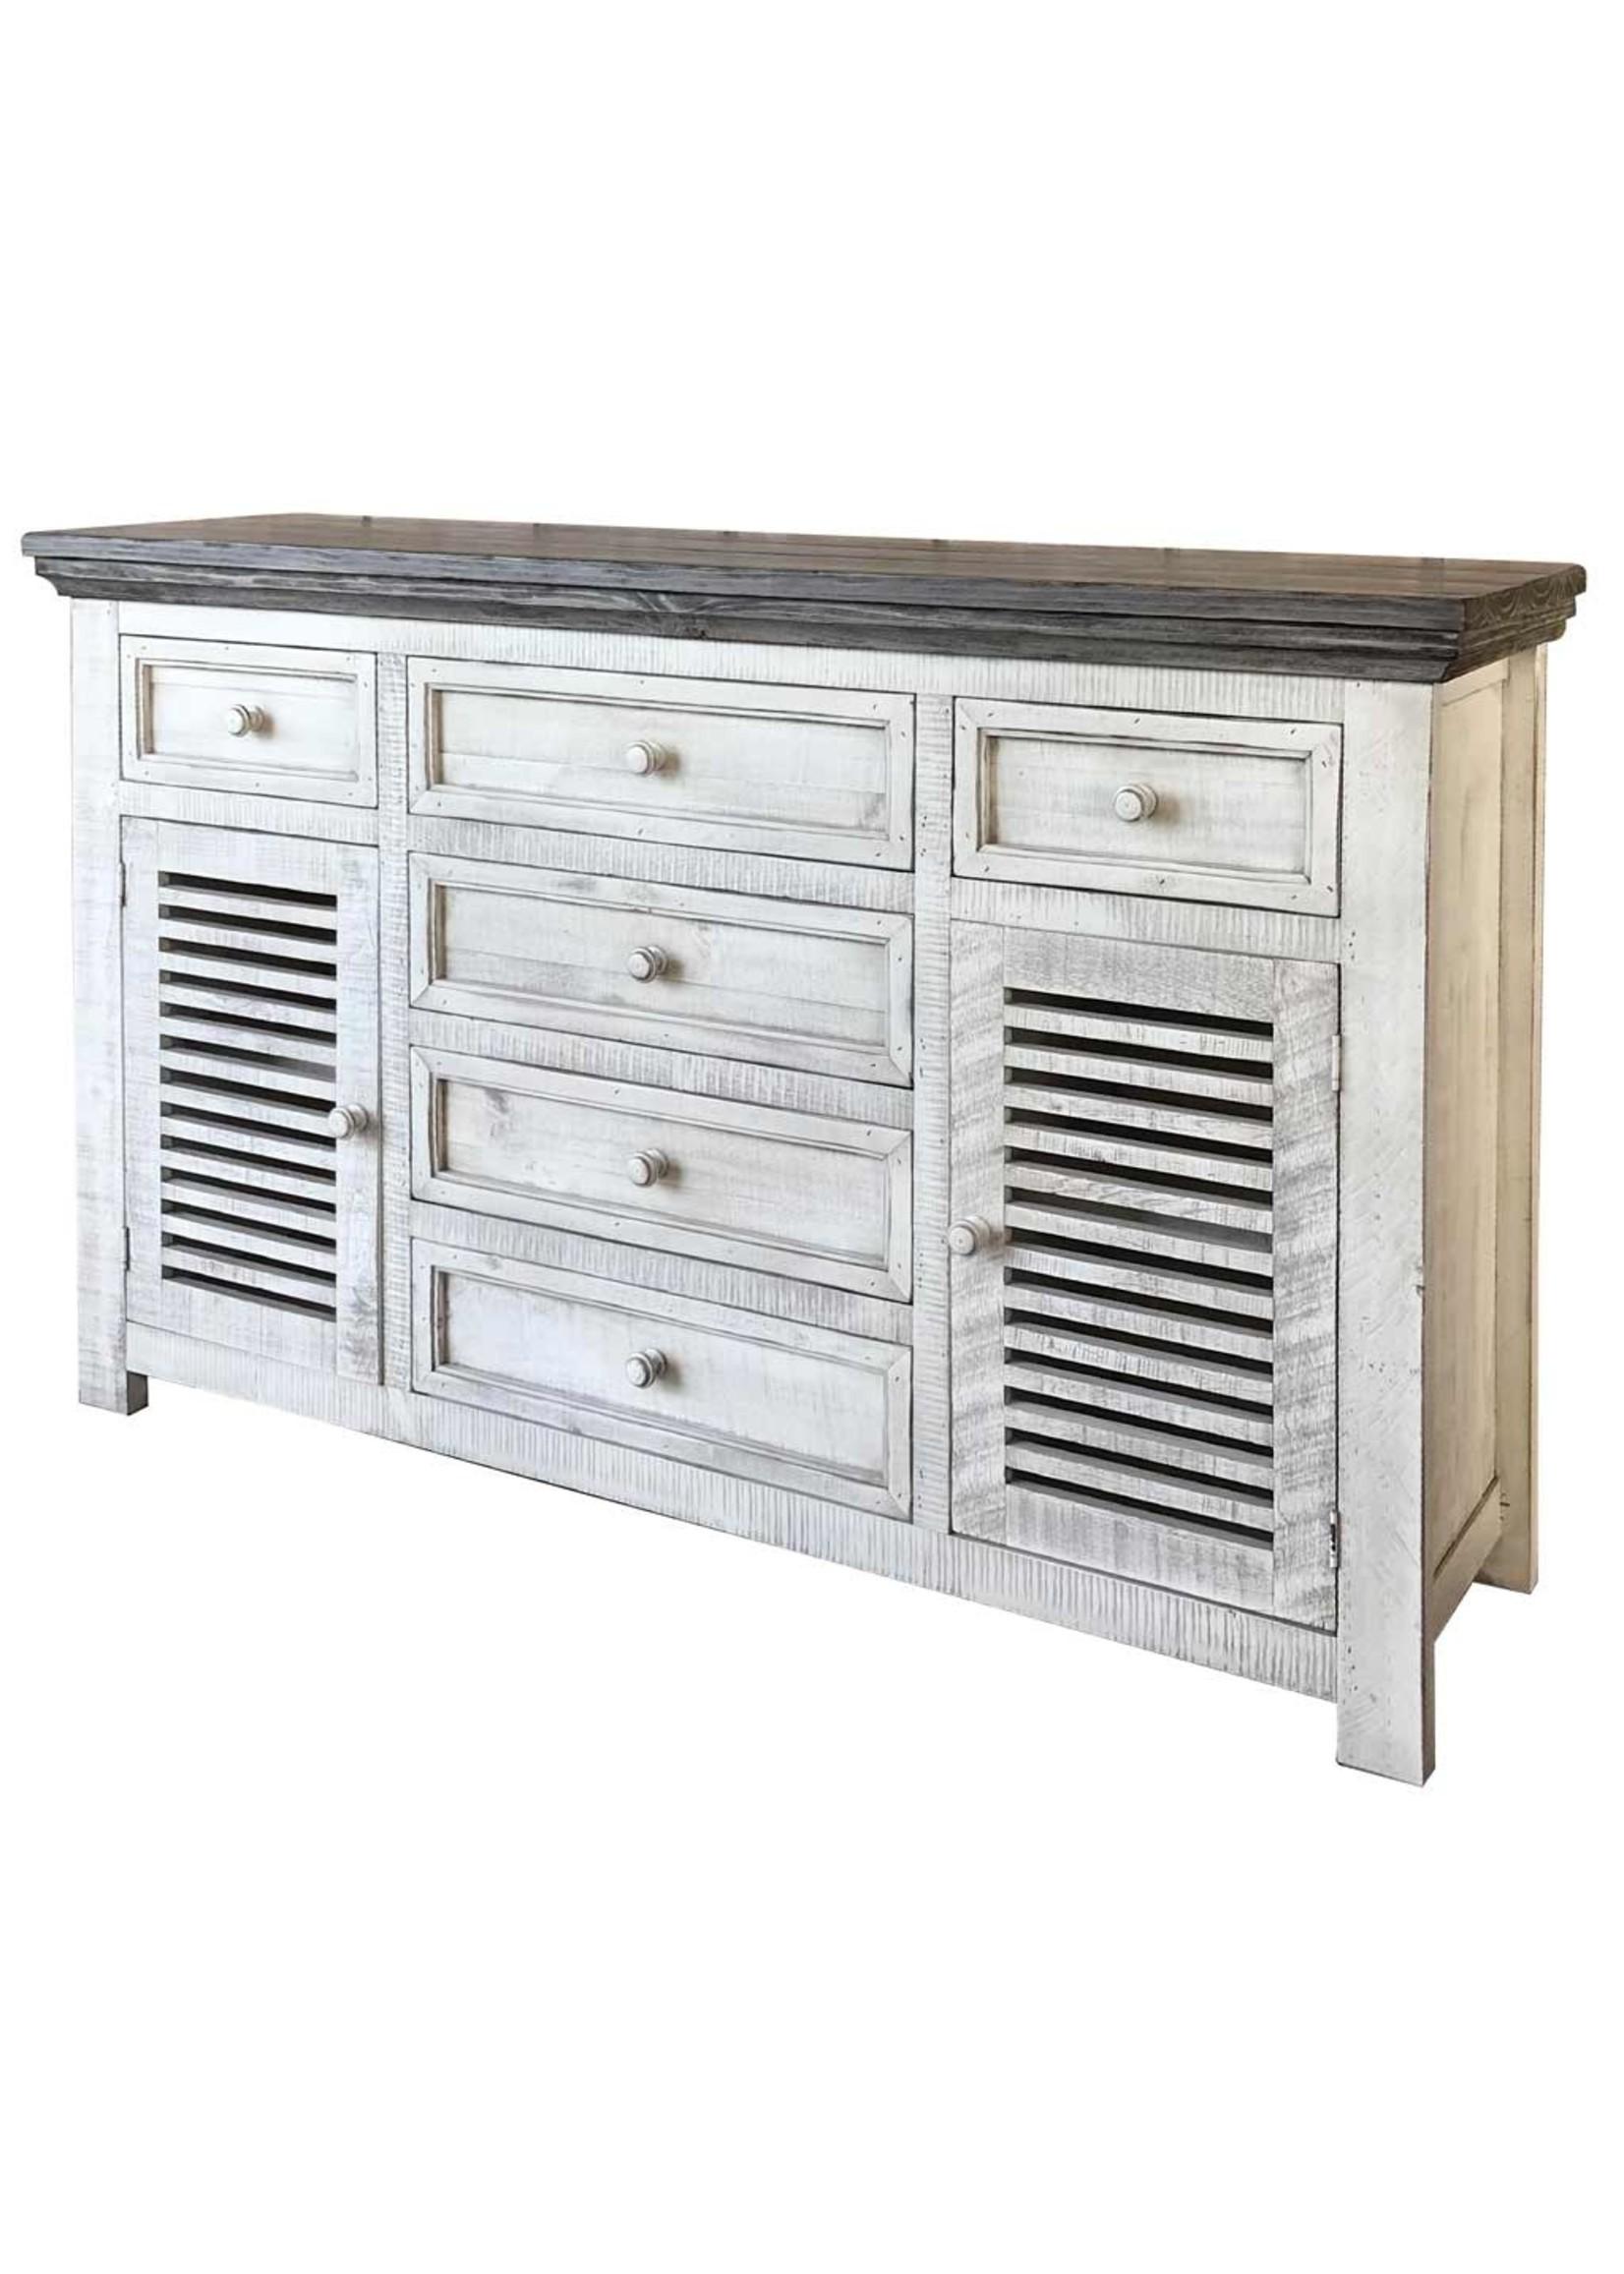 International Furniture Direct IFD470BUFFET IFD Buffet 6 Drawer & 2 Doors - white washed